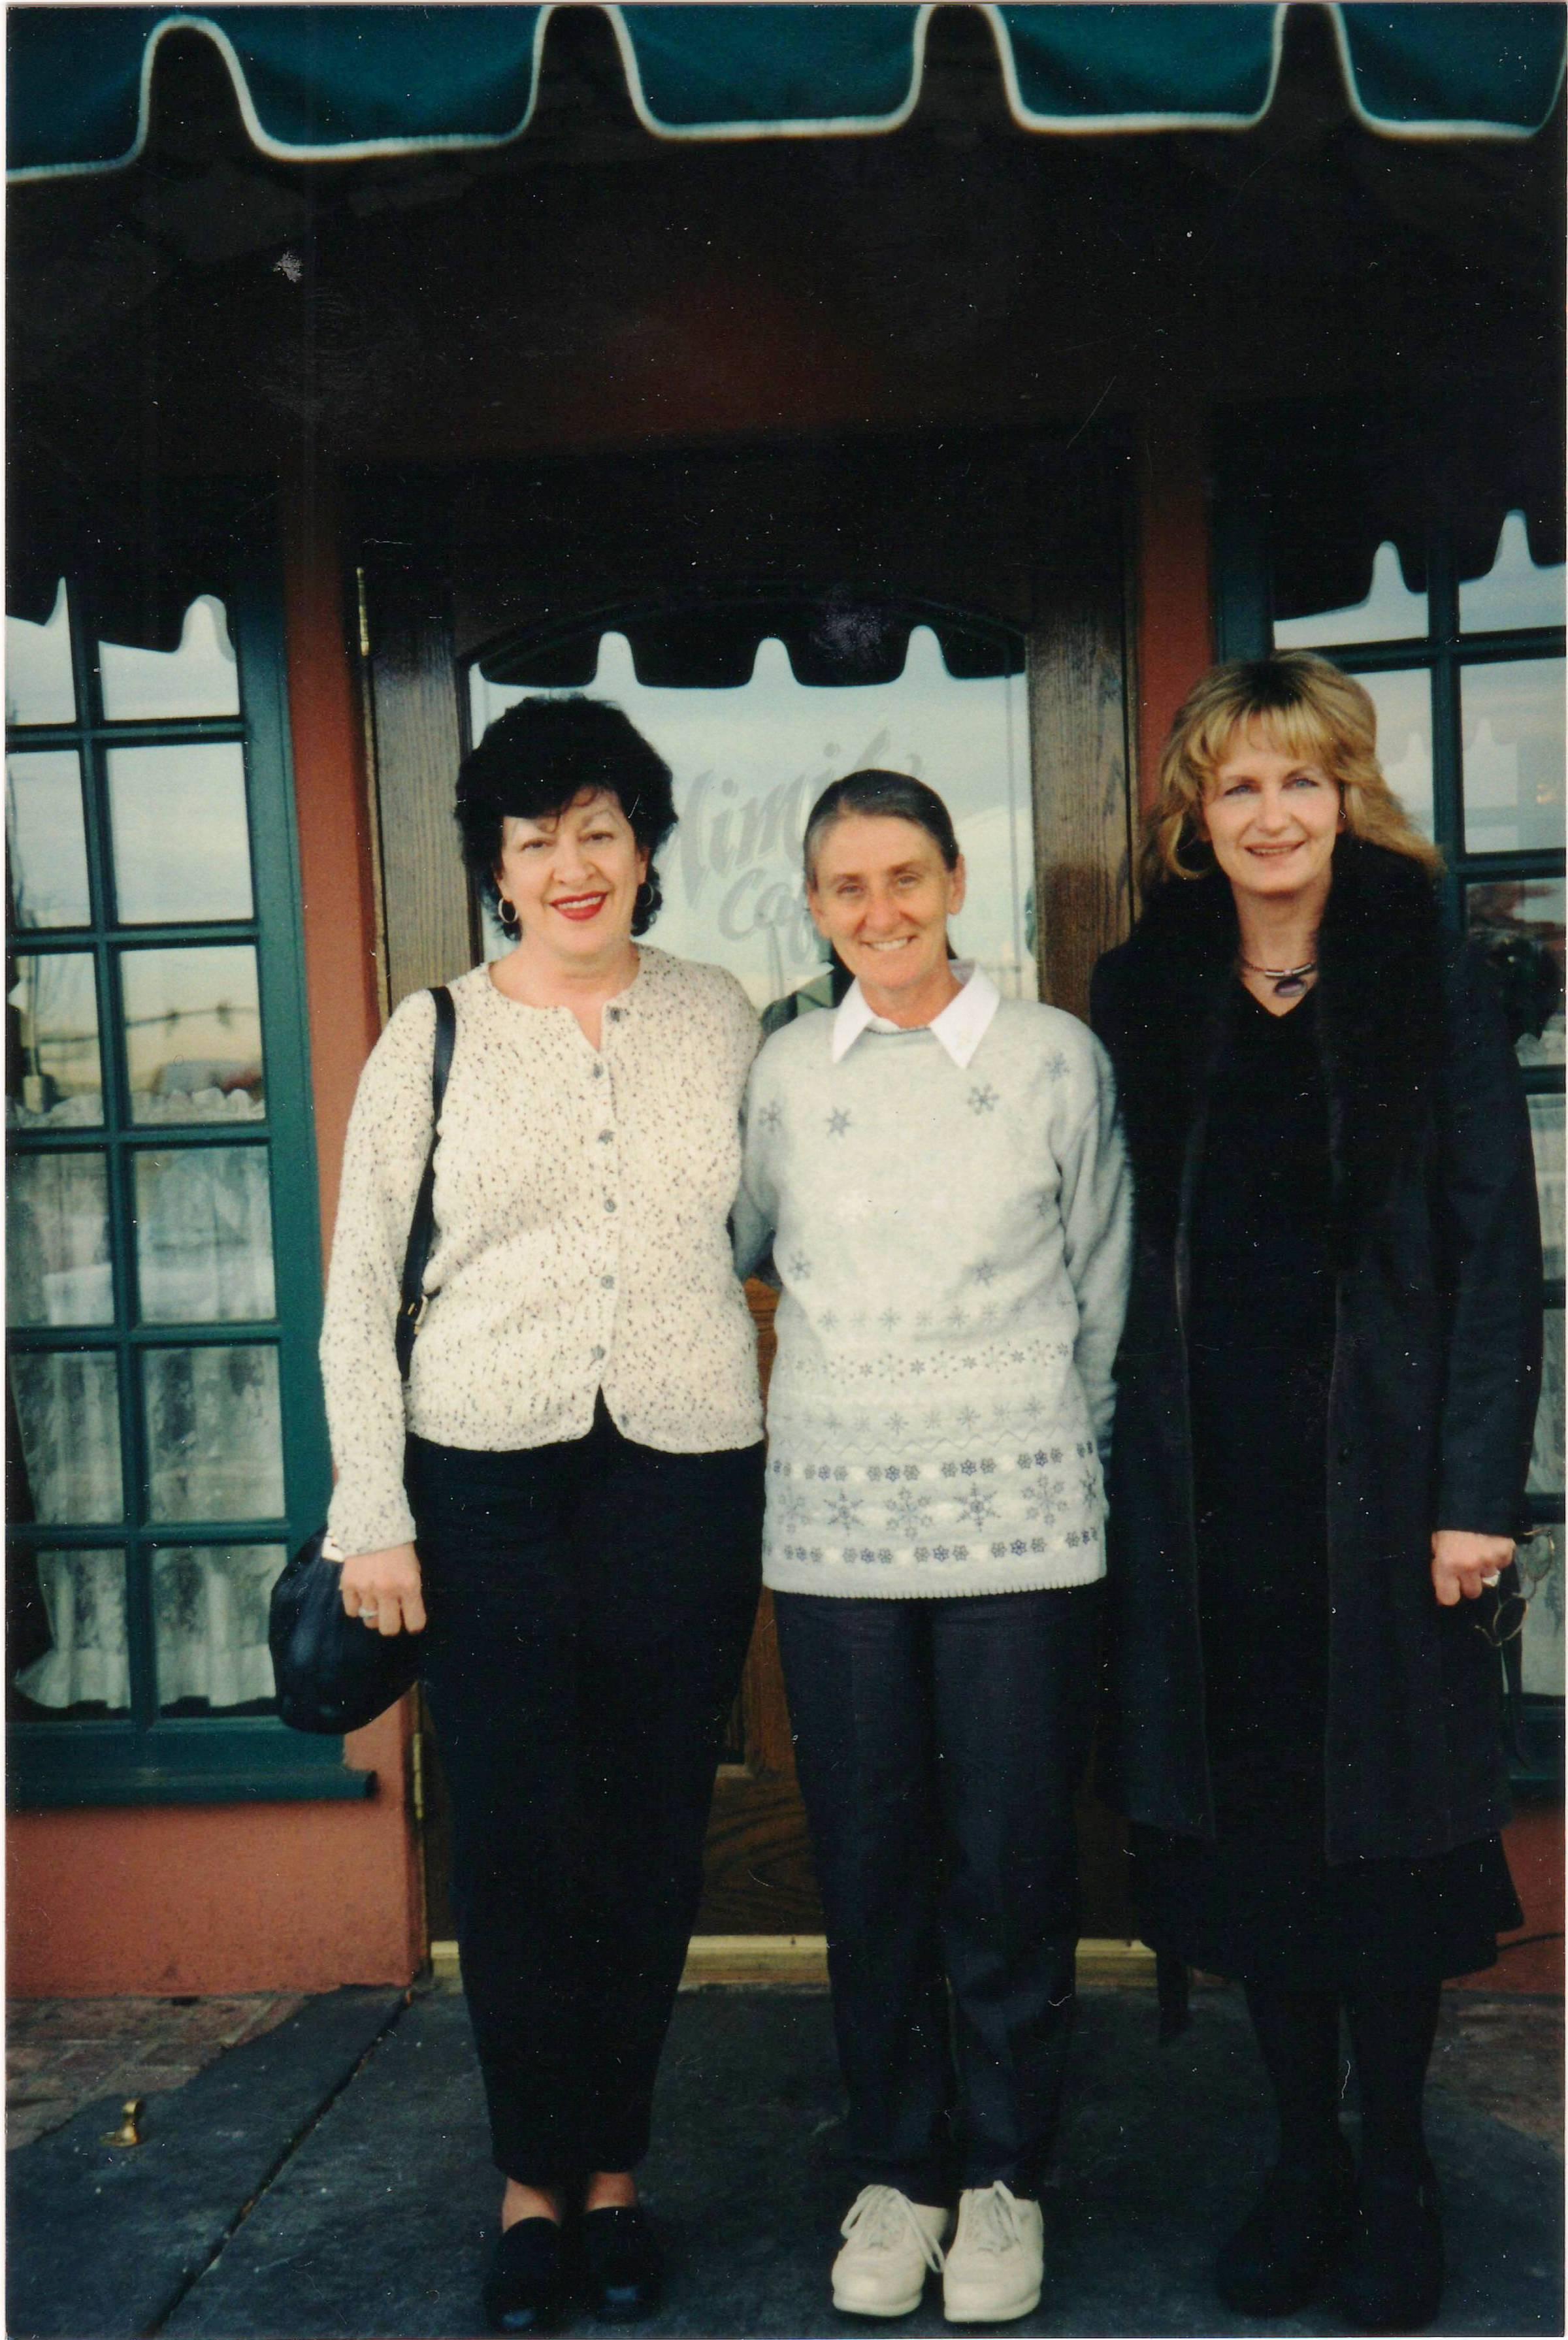 Patty Opp, Secretary Altar & Rosary; Sr. Cecilia from Papua New Guinea; Janice Bennett, President Altar & Rosary (2003)